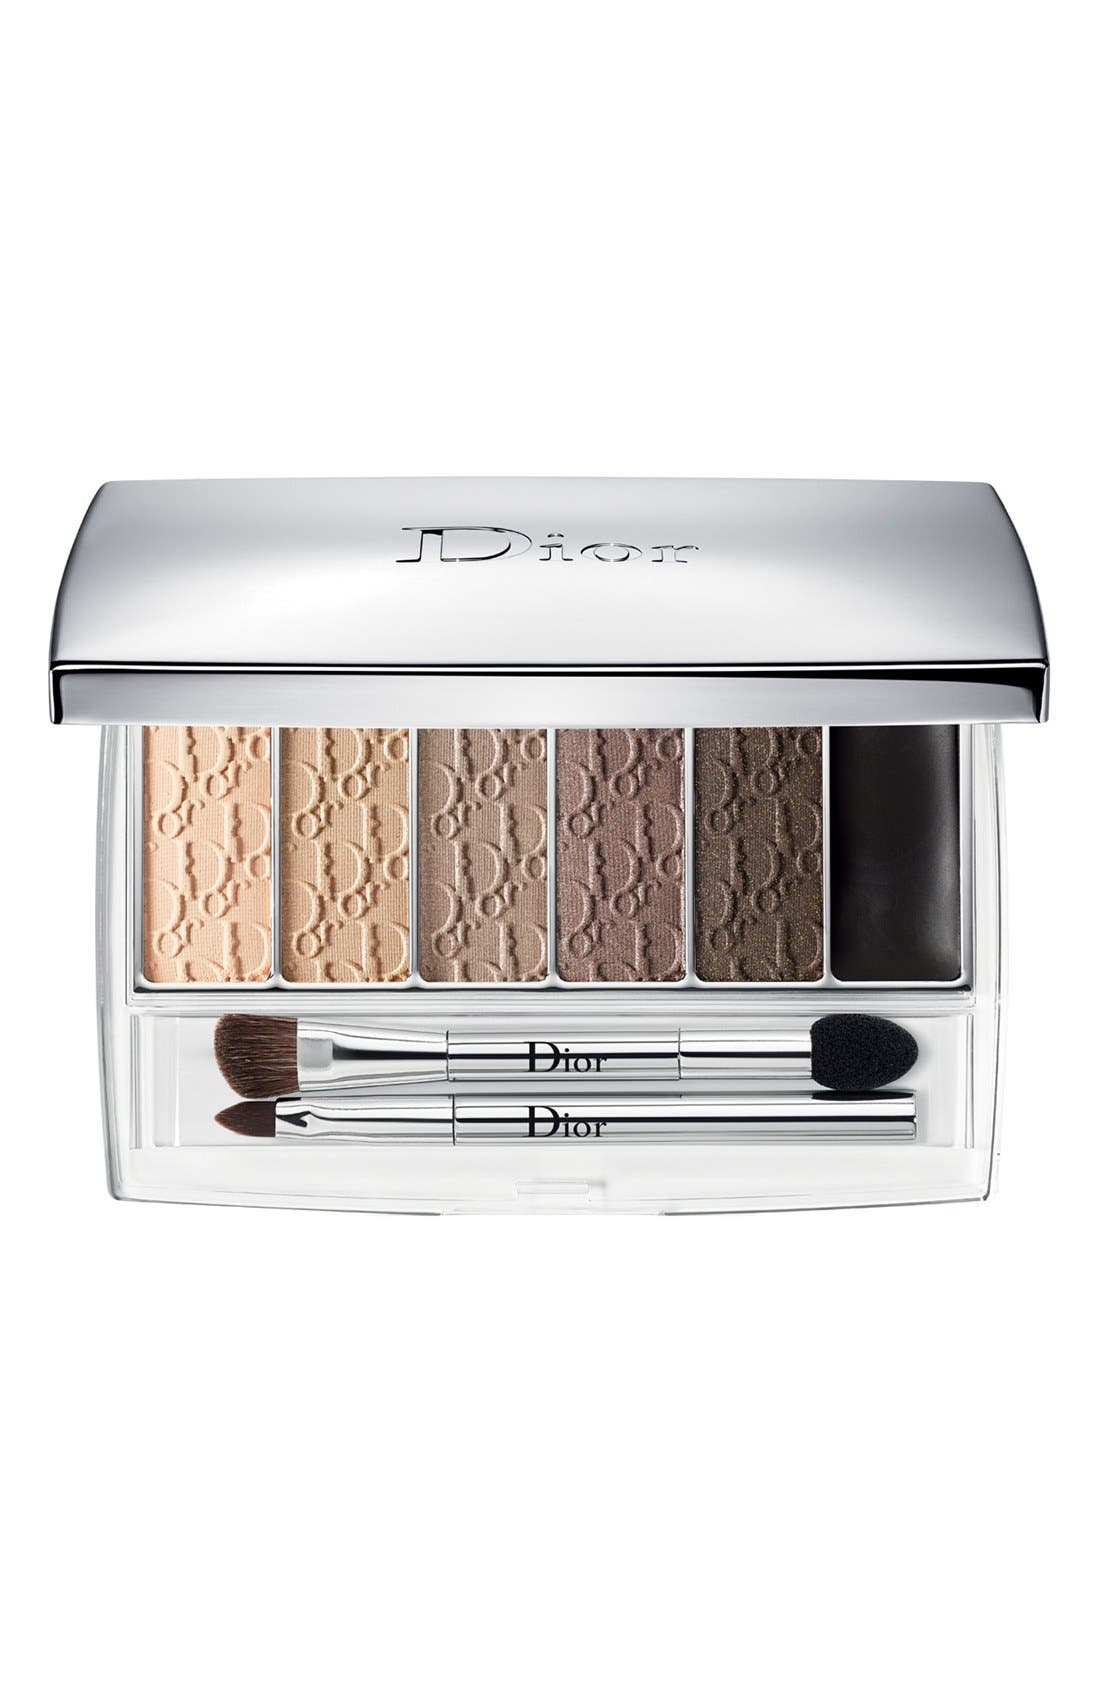 Dior 'Eye Reviver' Eyeshadow Palette